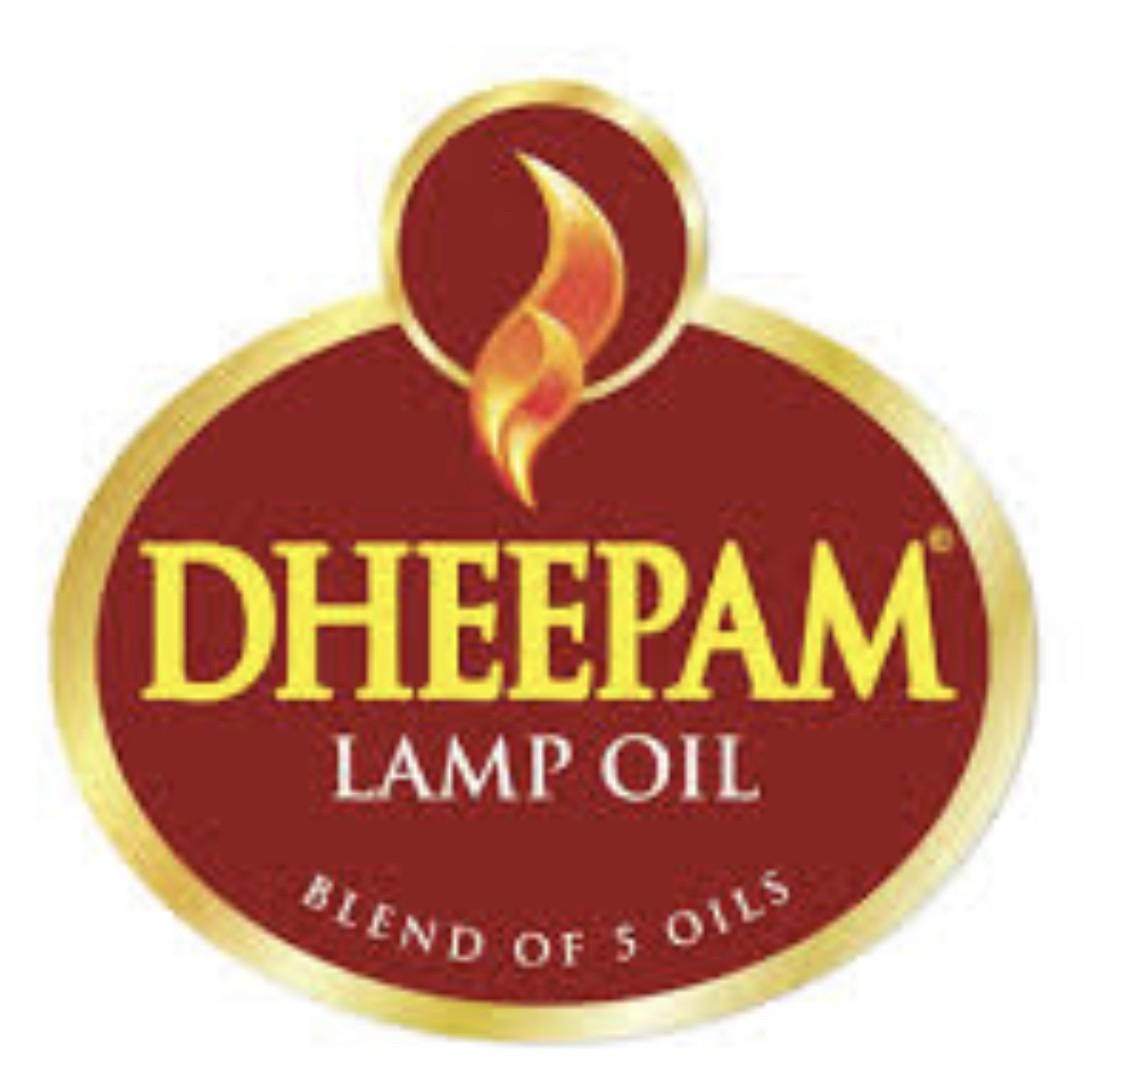 Dheepam